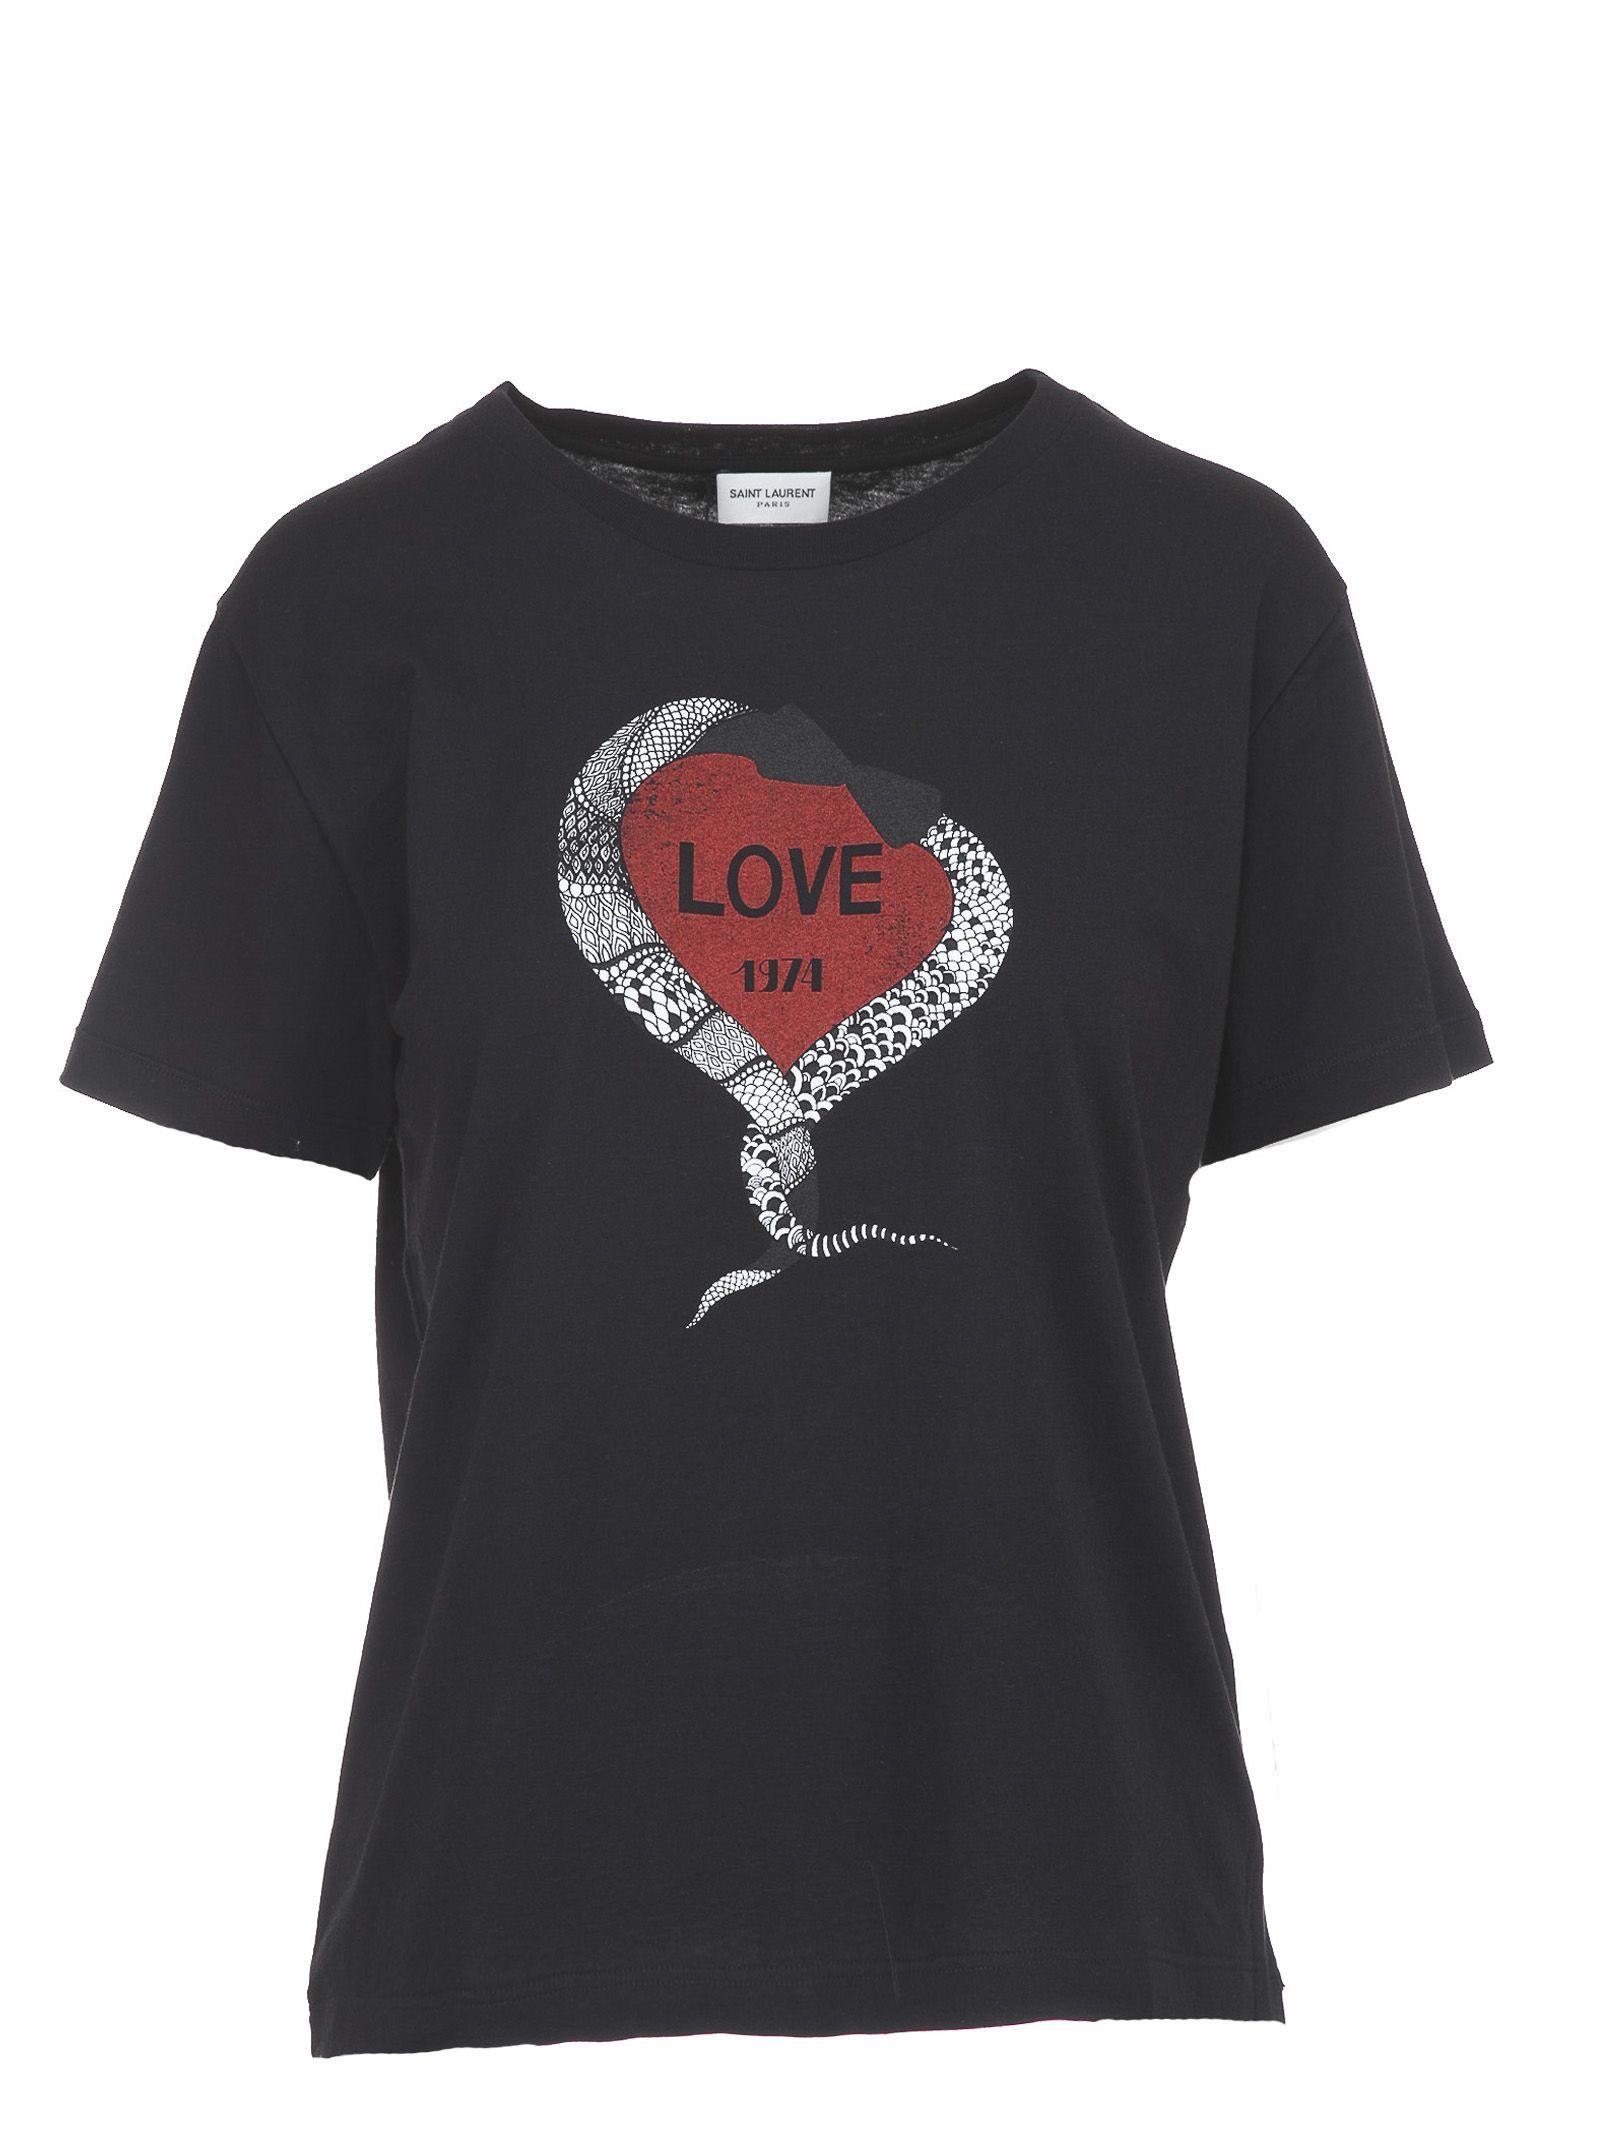 Love 1974 T-shirt - Black Saint Laurent Buy Cheap Really EPettoz